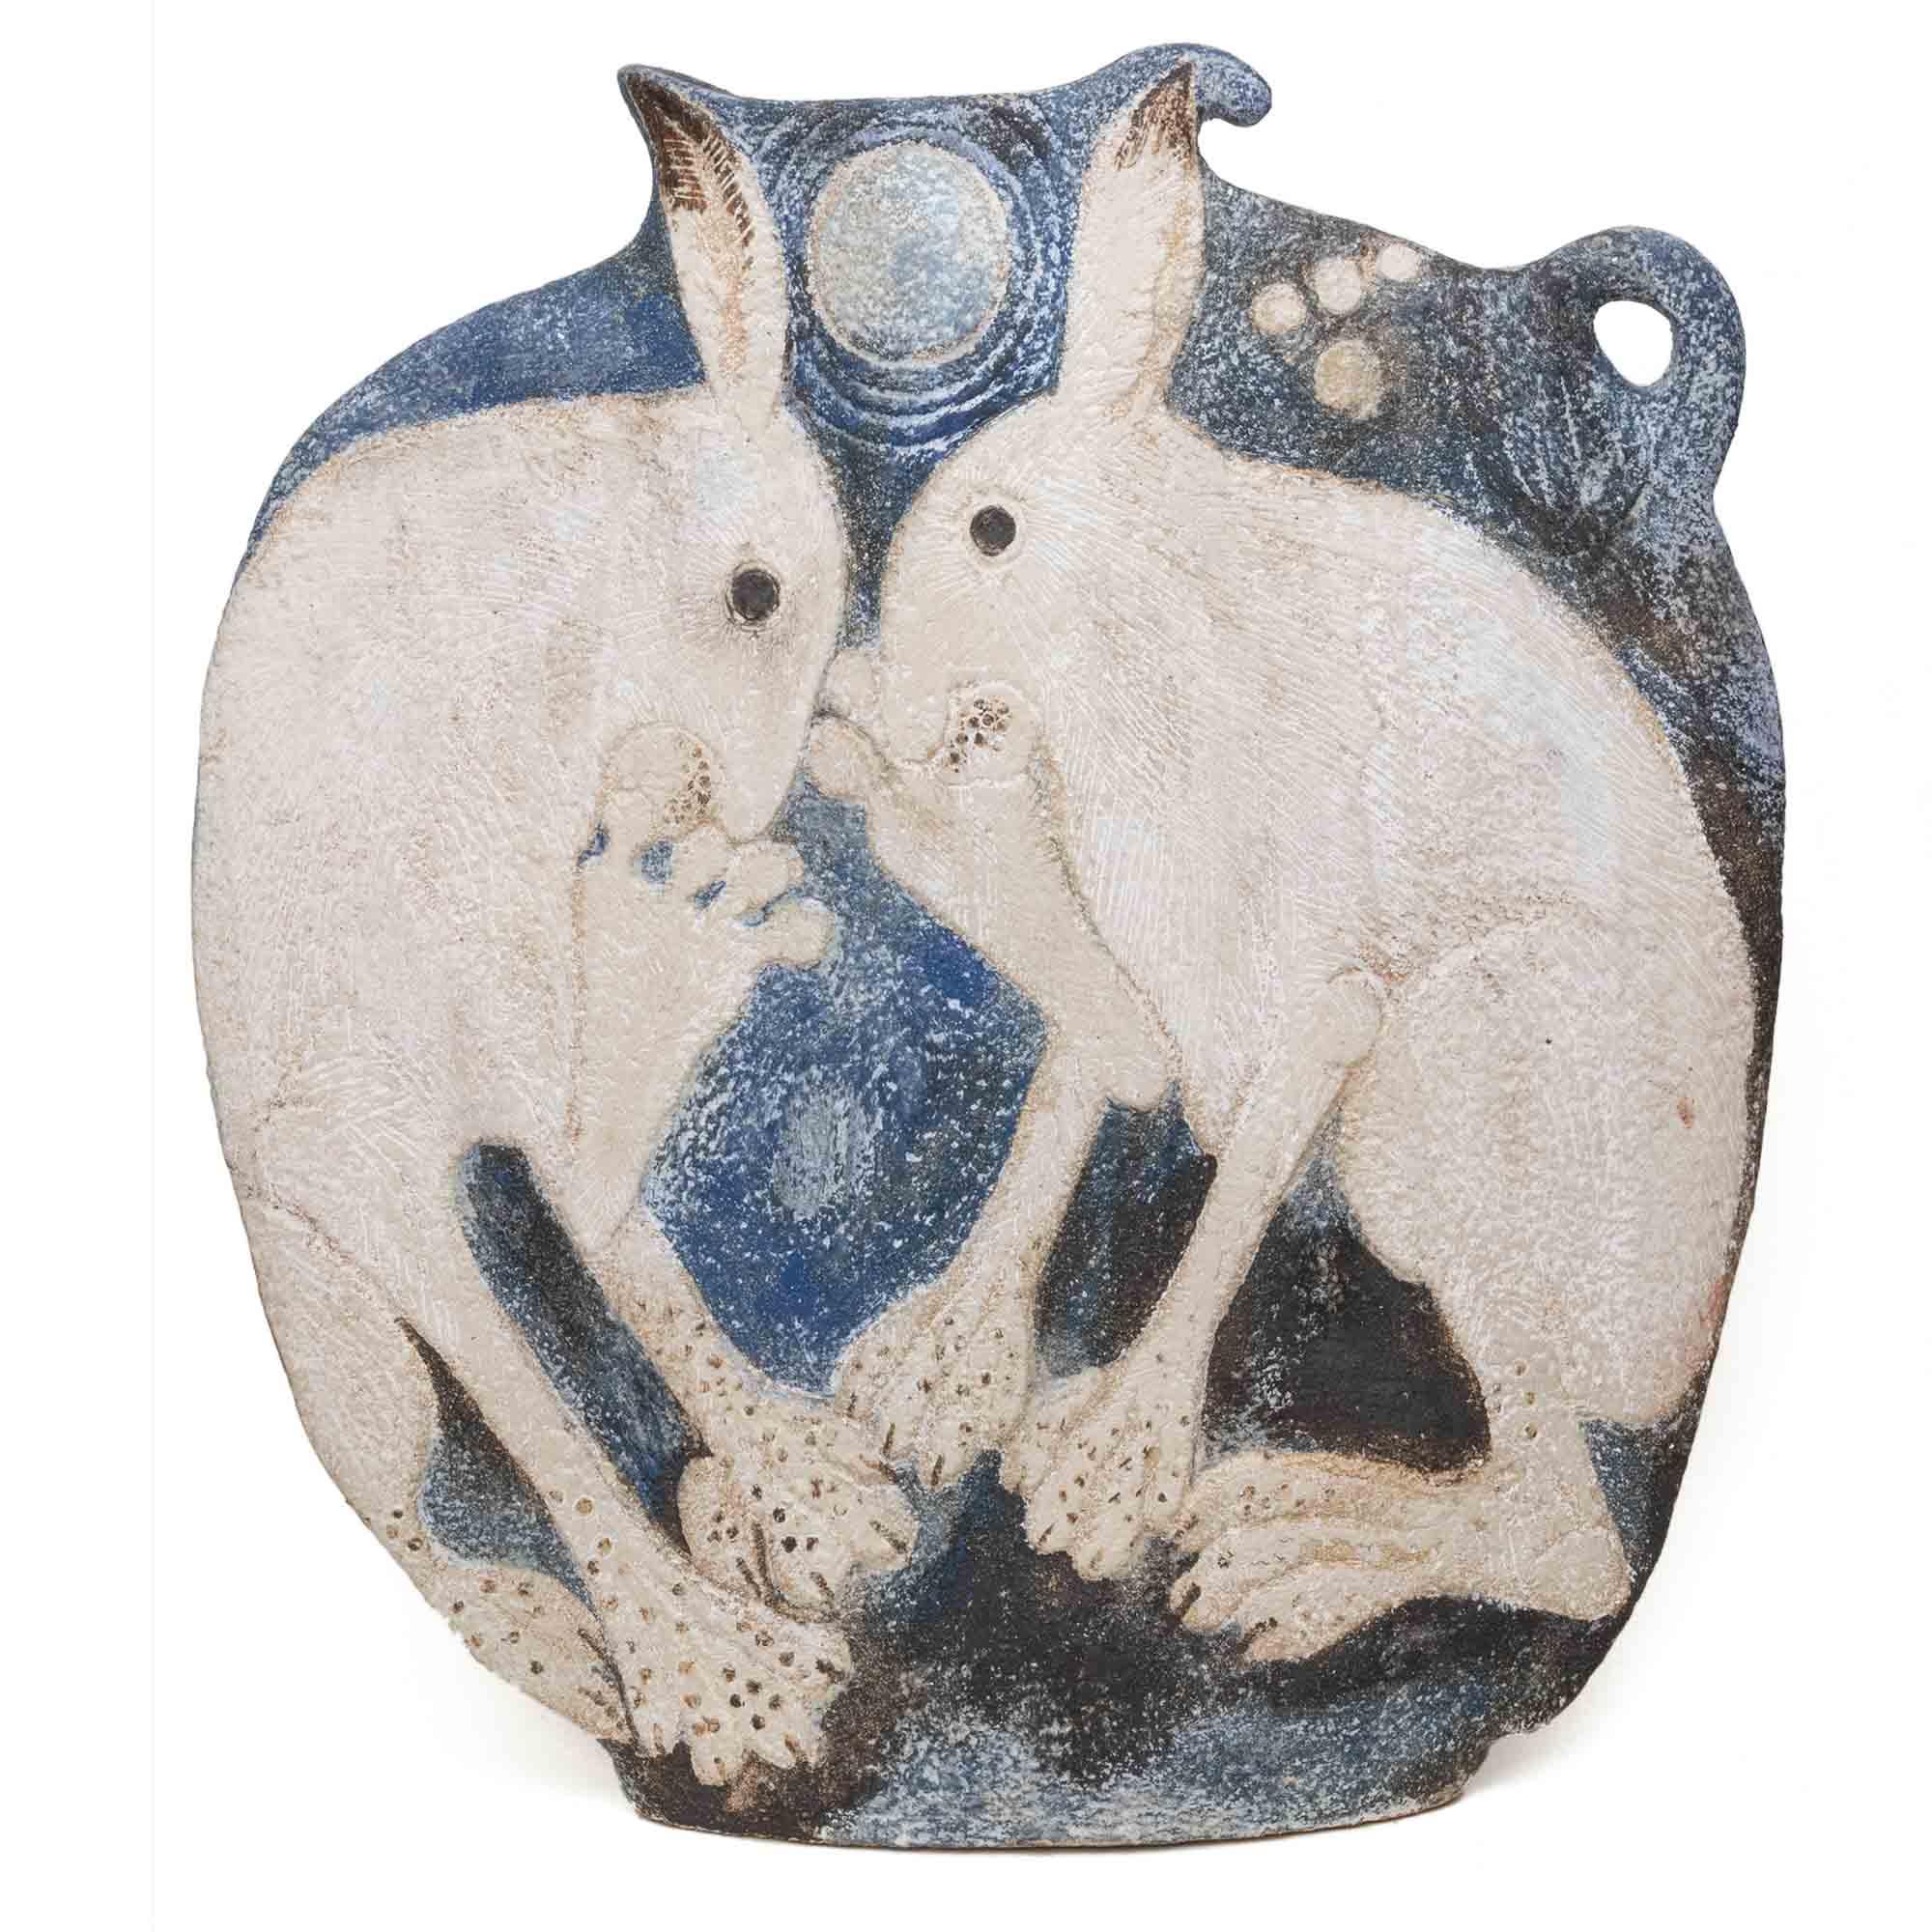 Michele Cowmeadow Hare Vase